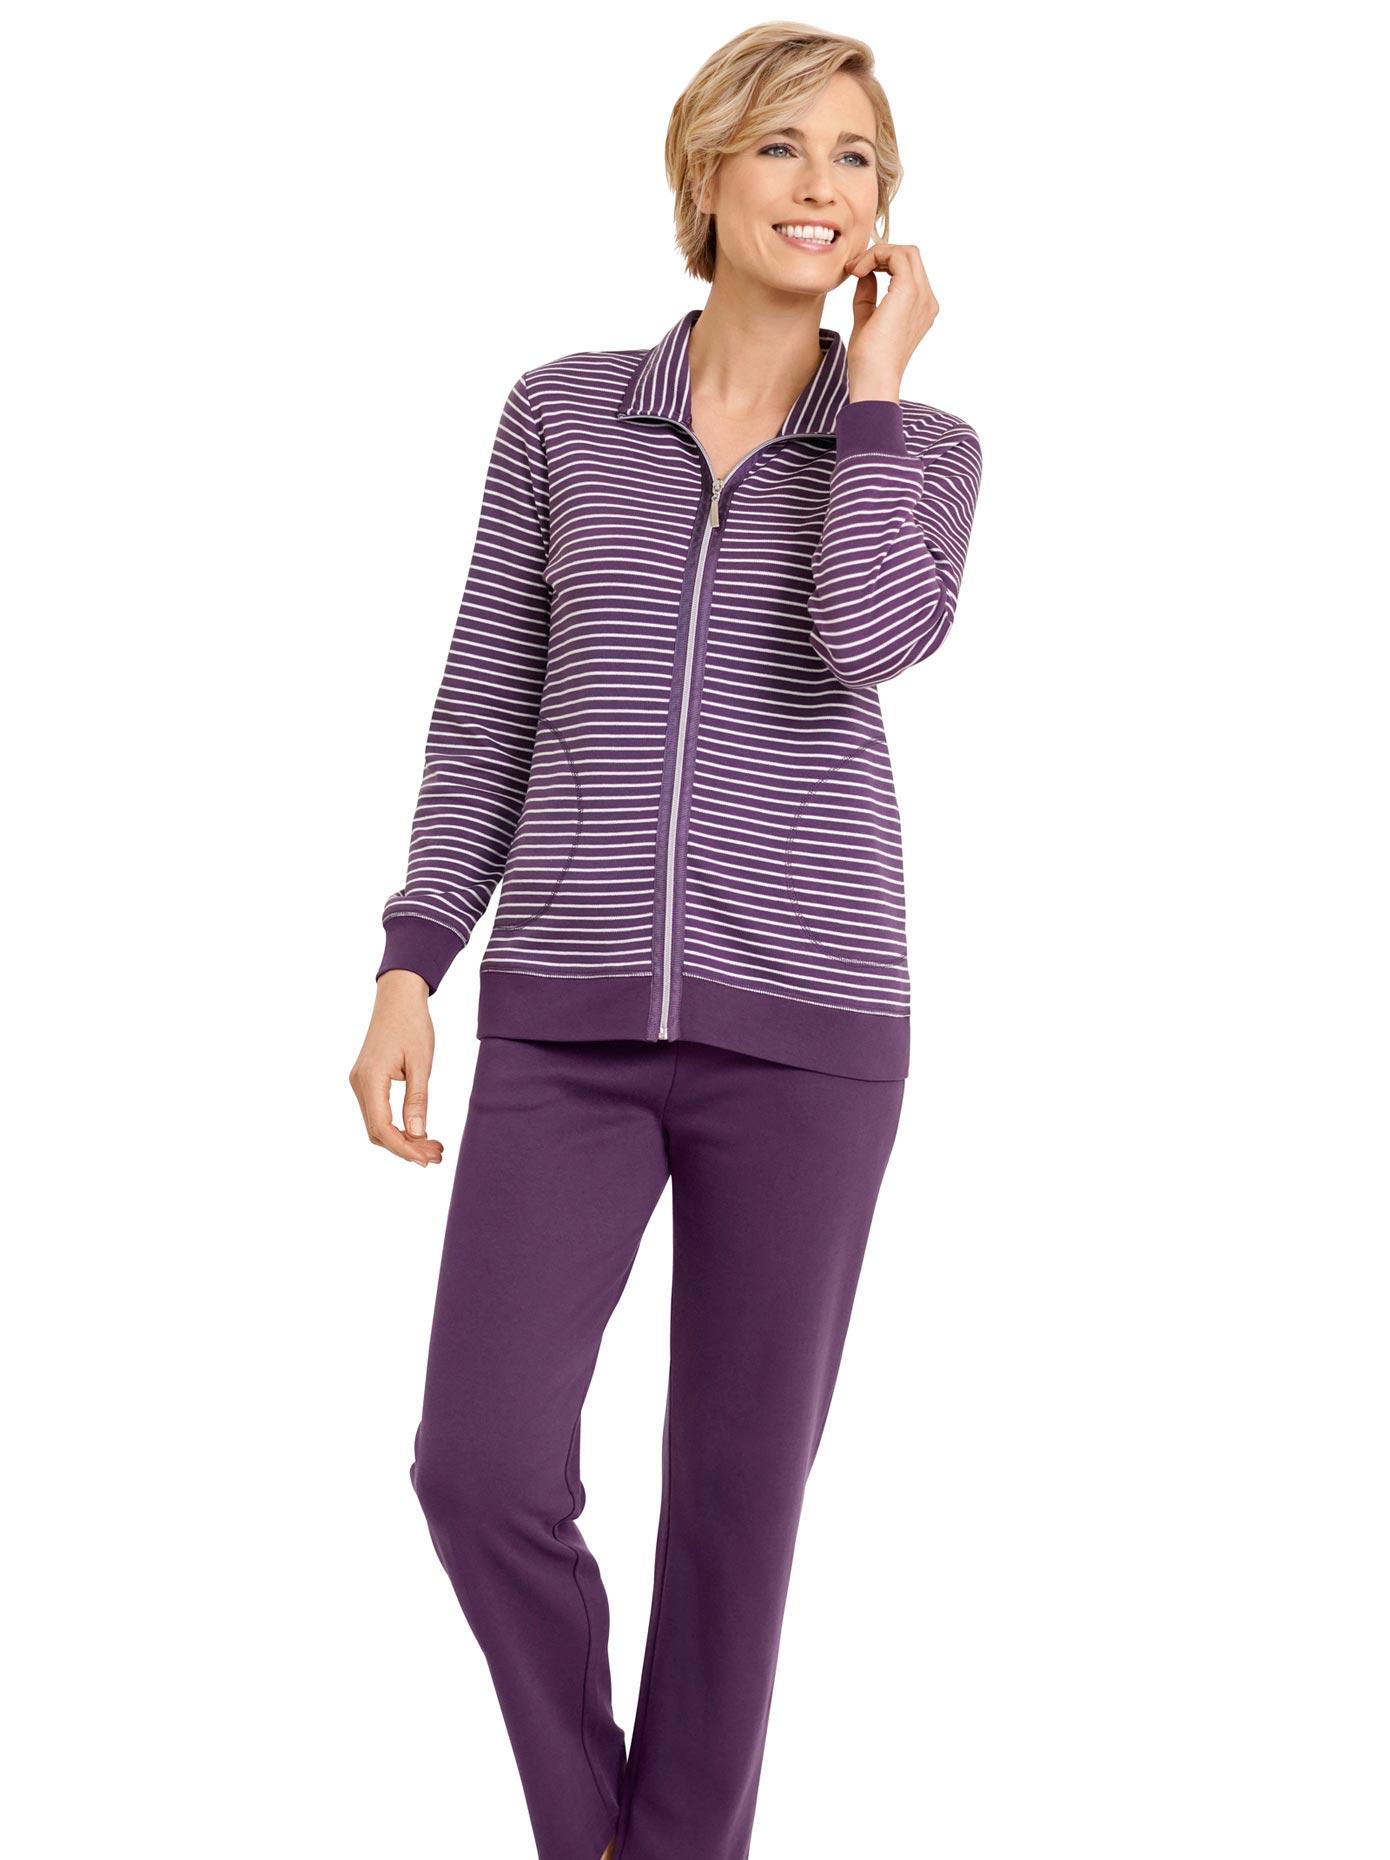 feel good Komfortabler Hausanzug | Bekleidung > Homewear > Hausanzüge